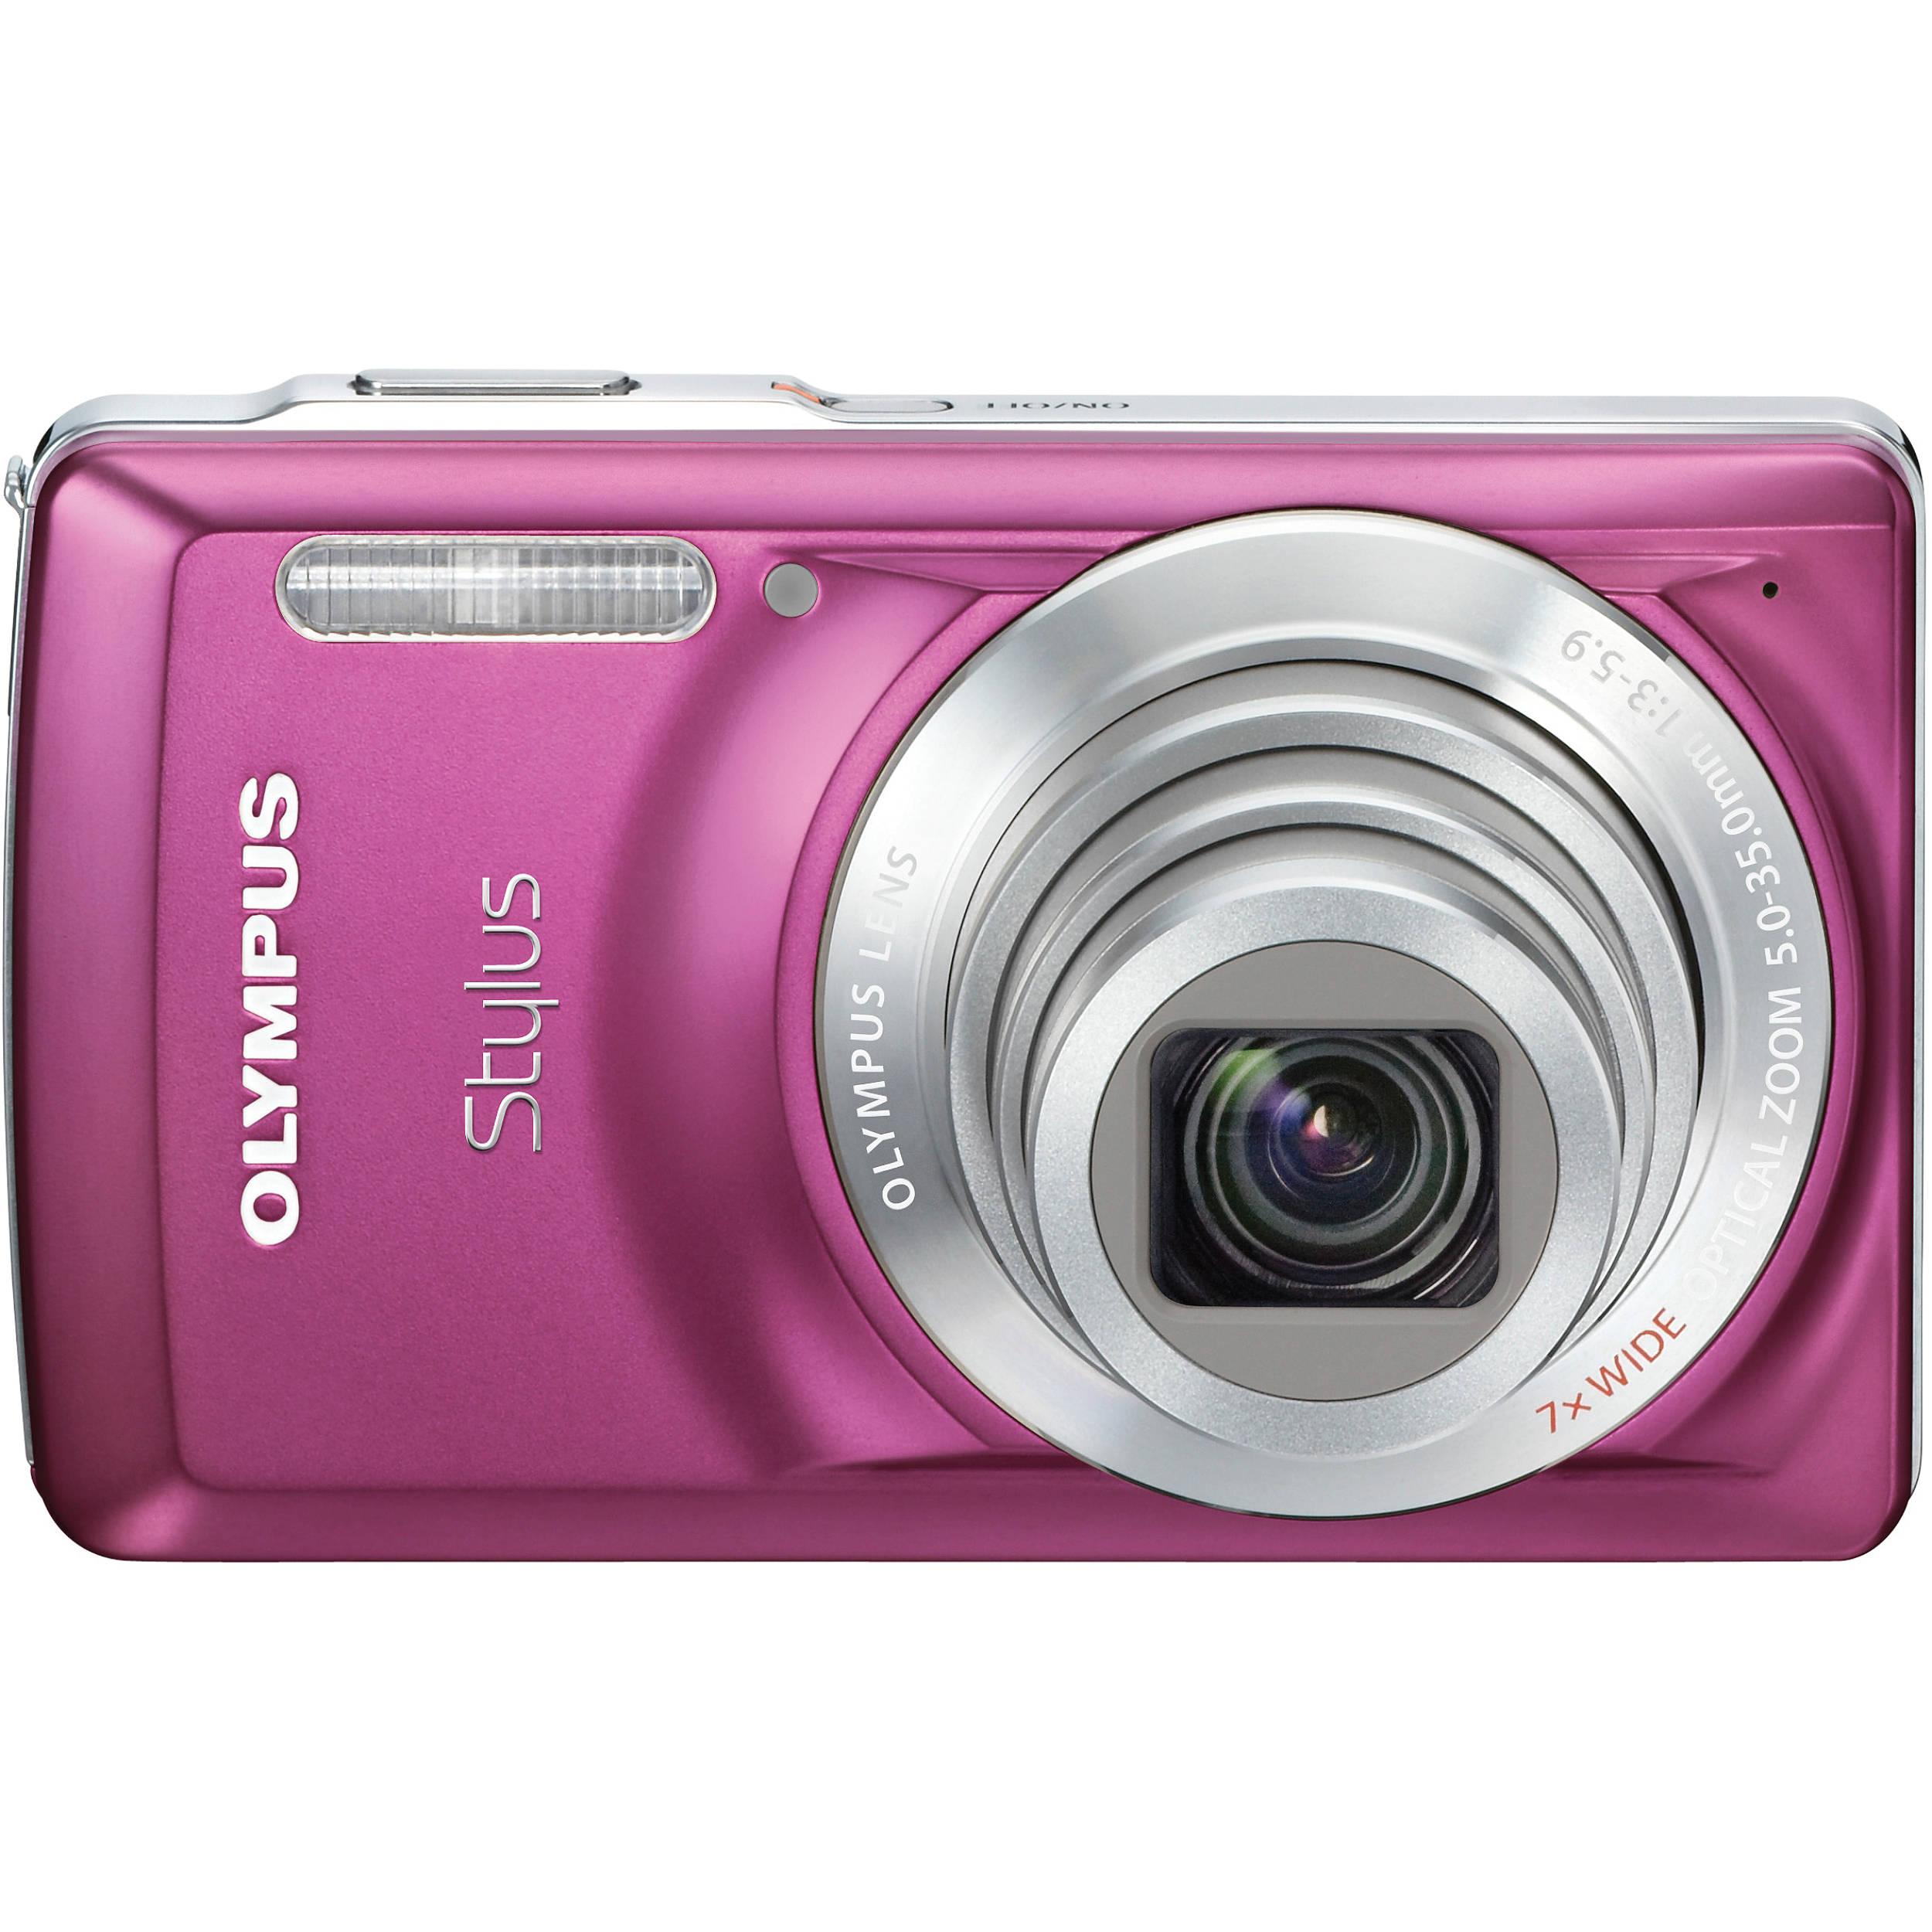 olympus stylus 7030 digital camera purple 227580 b h photo rh bhphotovideo com Olympus Stylus 35Mm Camera Olympus Stylus Zoom 140